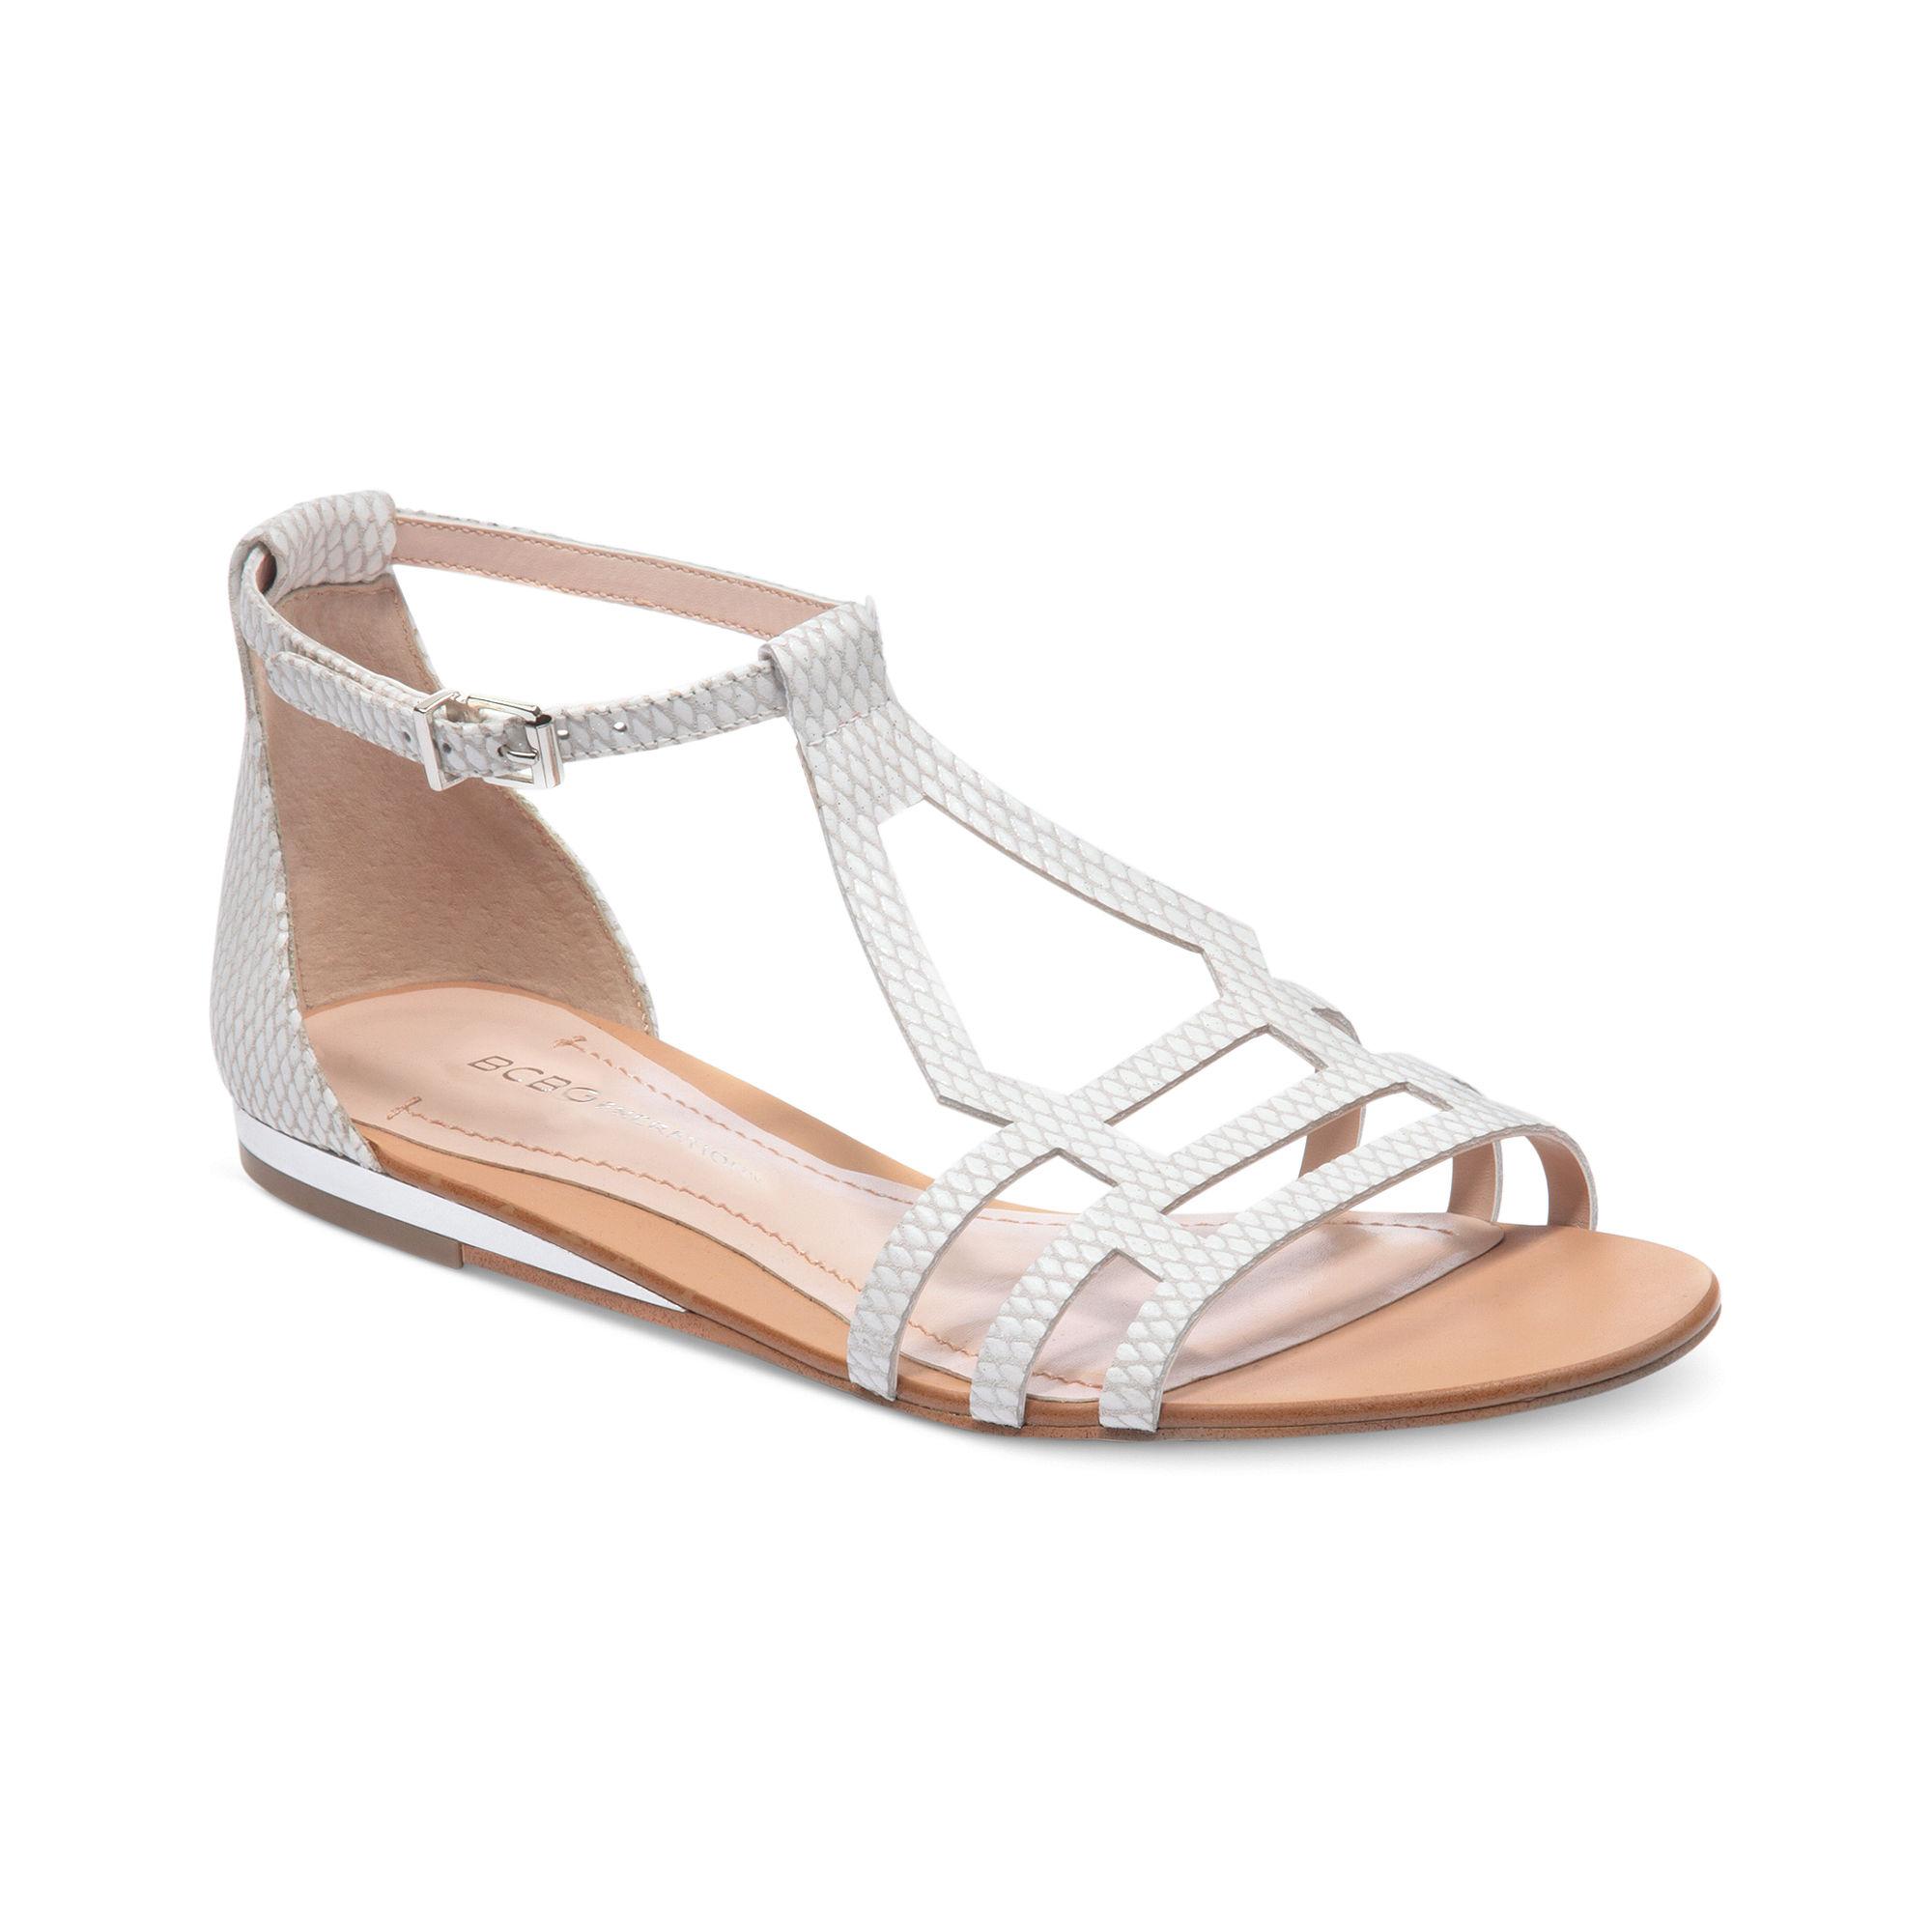 Lyst Bcbgeneration Fabeena Flat Sandals In Metallic